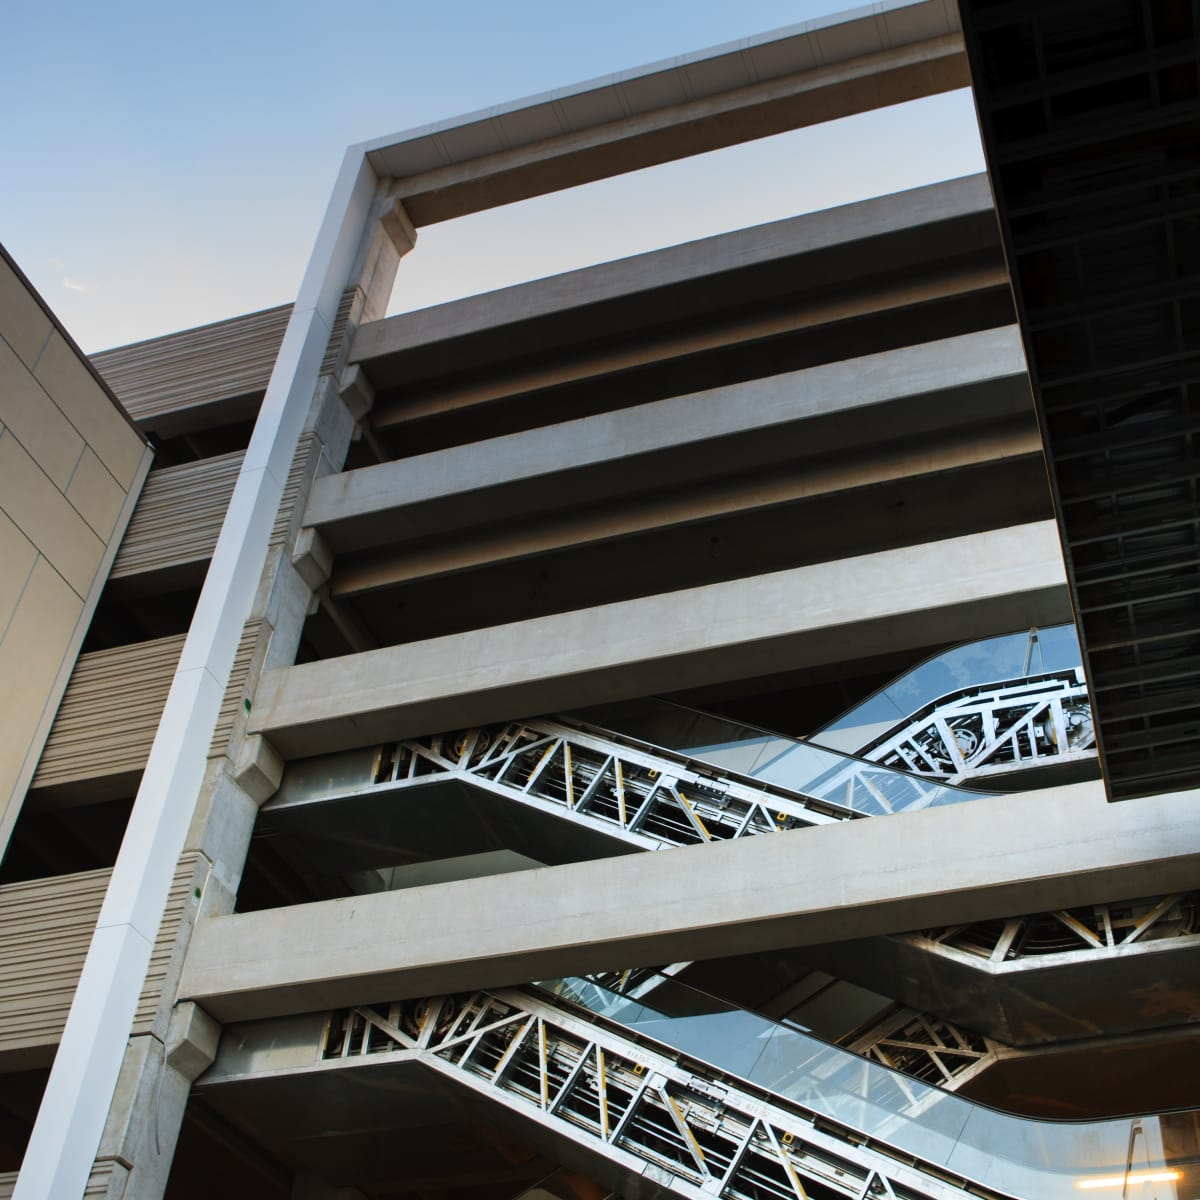 River Oaks District rendering of parking garage with glass elevators